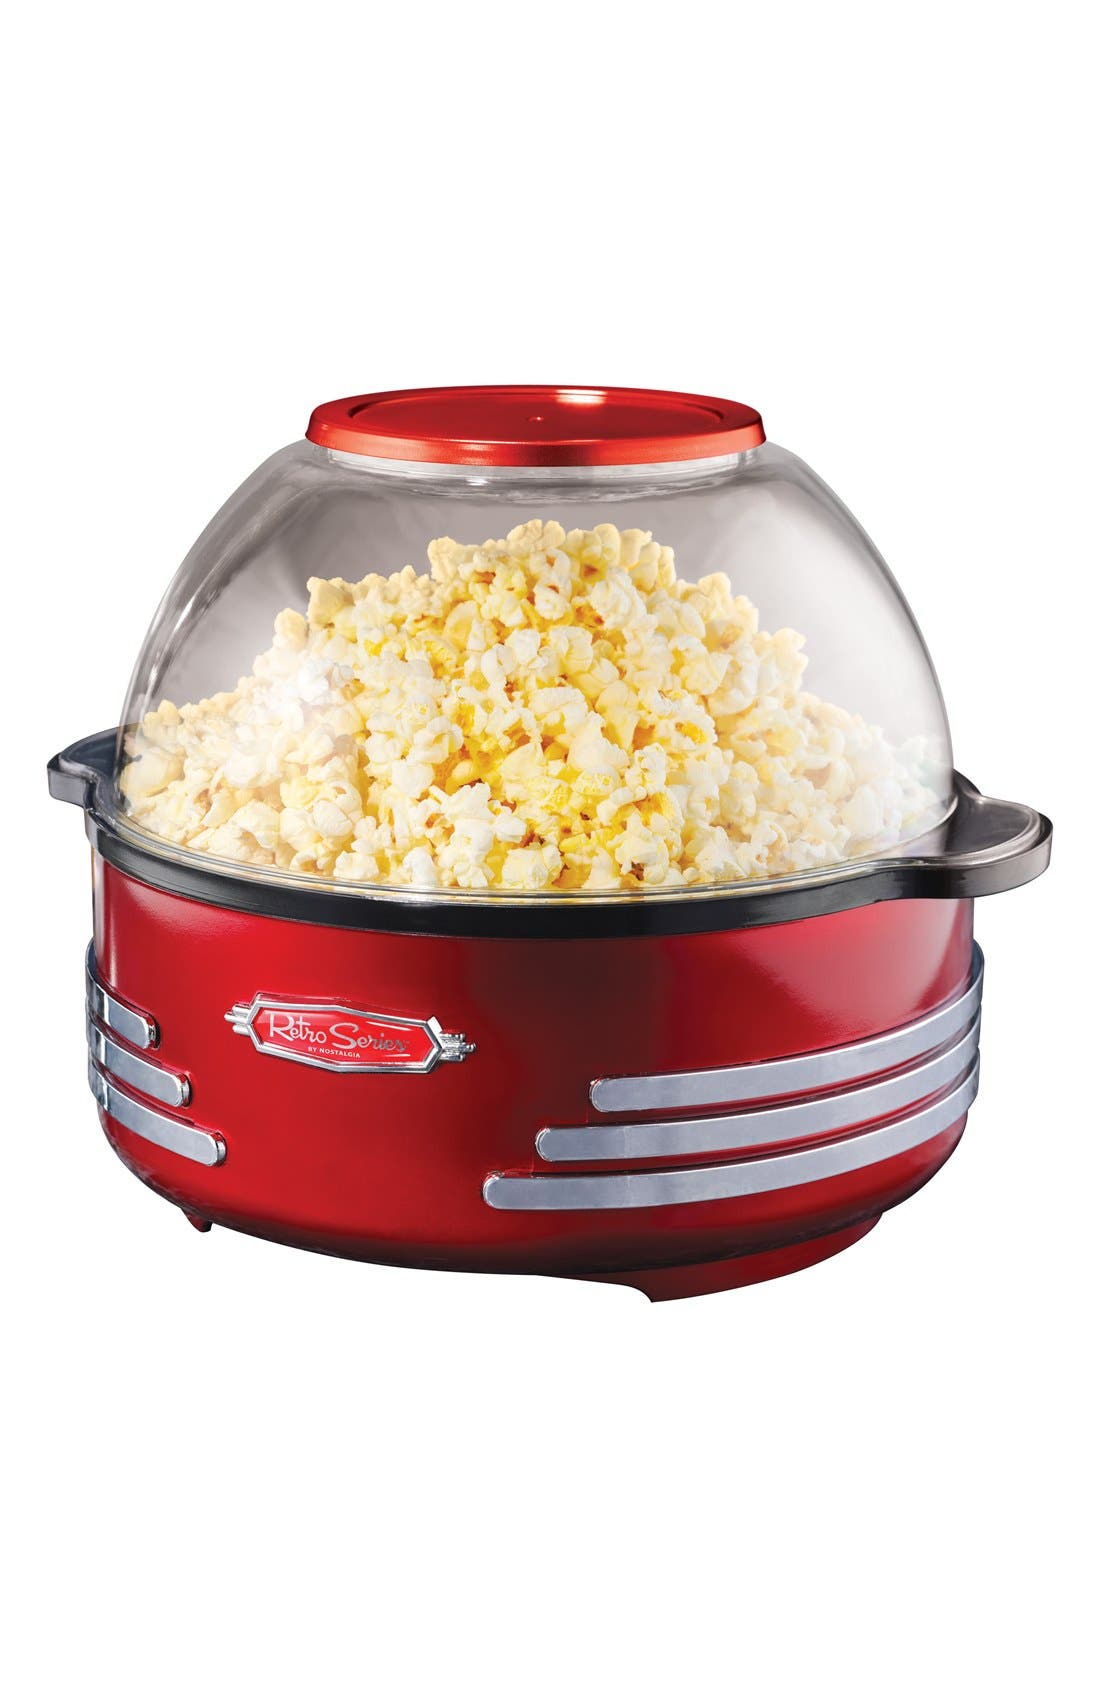 Nostalgia Electronics Retro Stirring Popcorn Maker,                             Main thumbnail 1, color,                             600